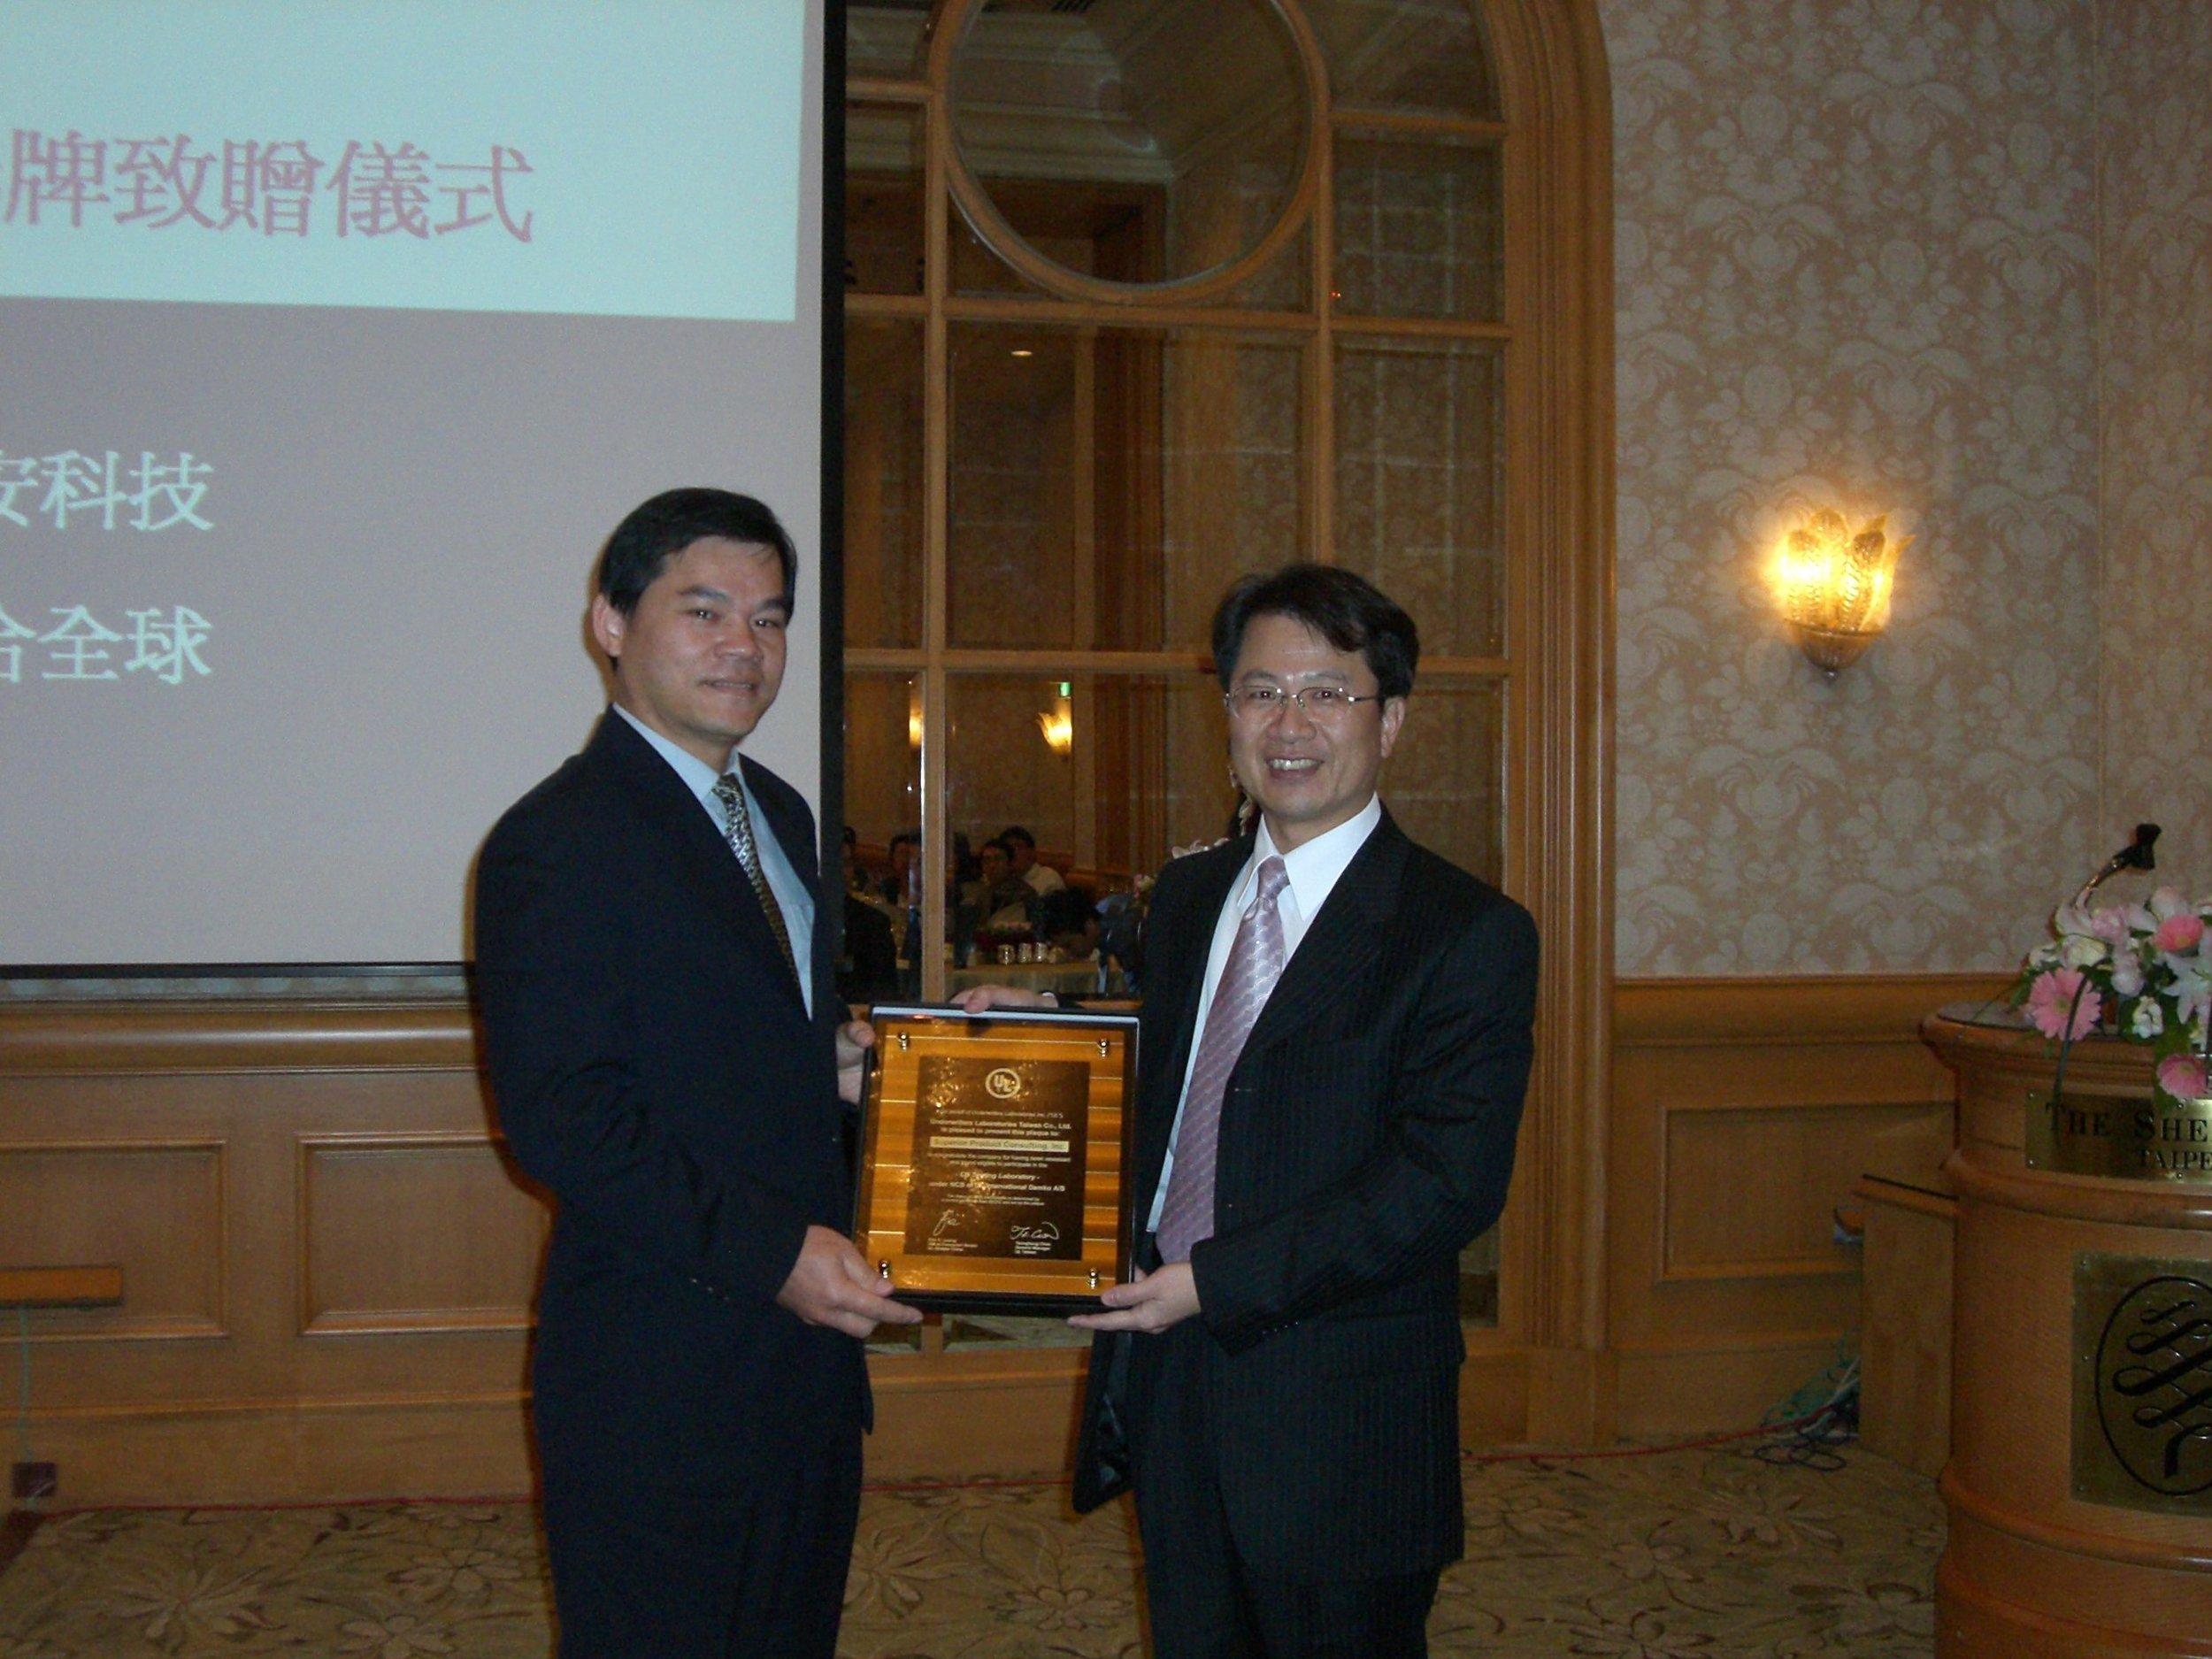 UL-CBTL Award